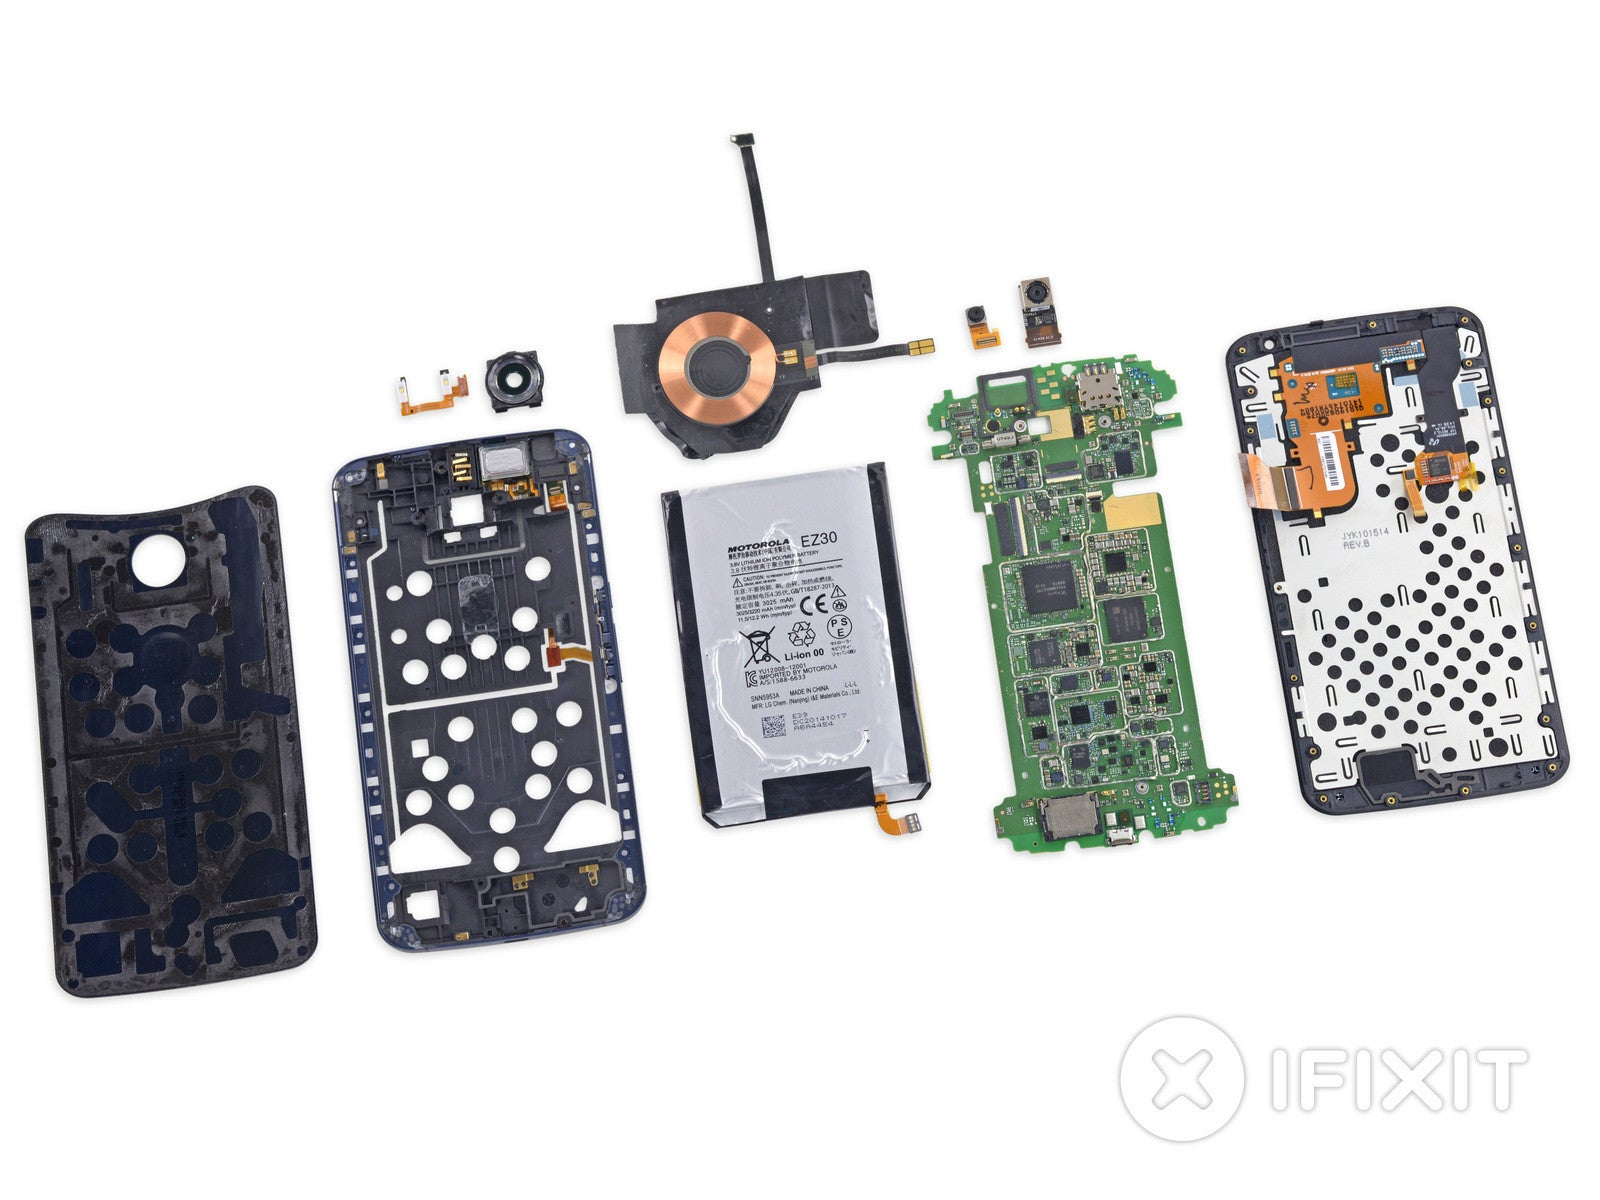 Nexus 6 Teardown: A Big Beast Full of Beautiful Guts